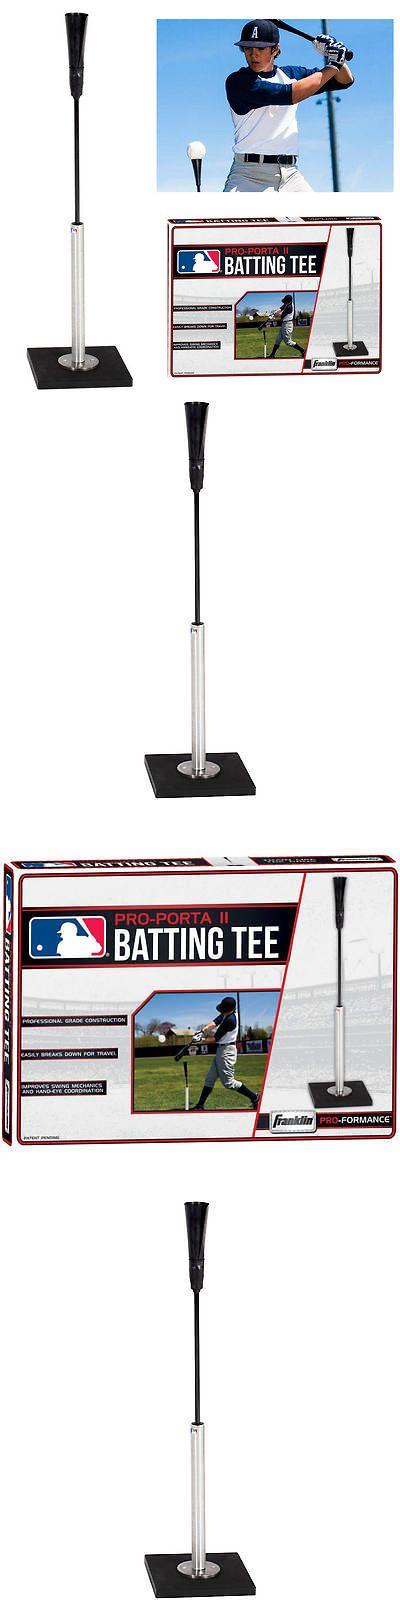 Batting Tees 108139: Baseball Batting Tee Portable Tee 37 Baseball Hitting Practice Training Aids -> BUY IT NOW ONLY: $50.37 on eBay!